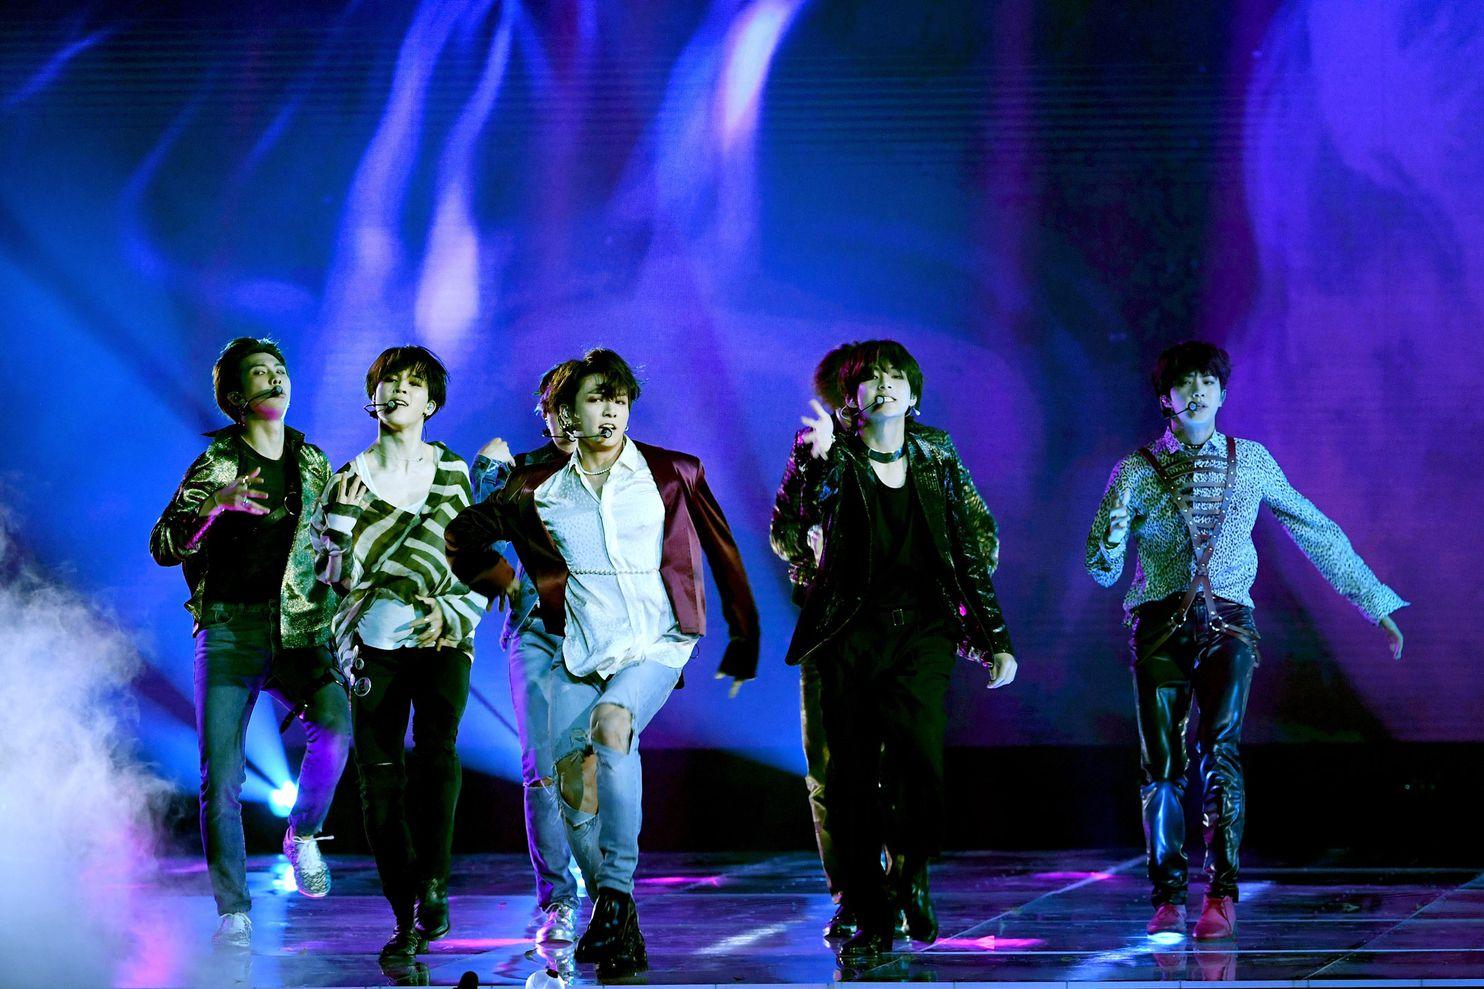 bts korean boy band